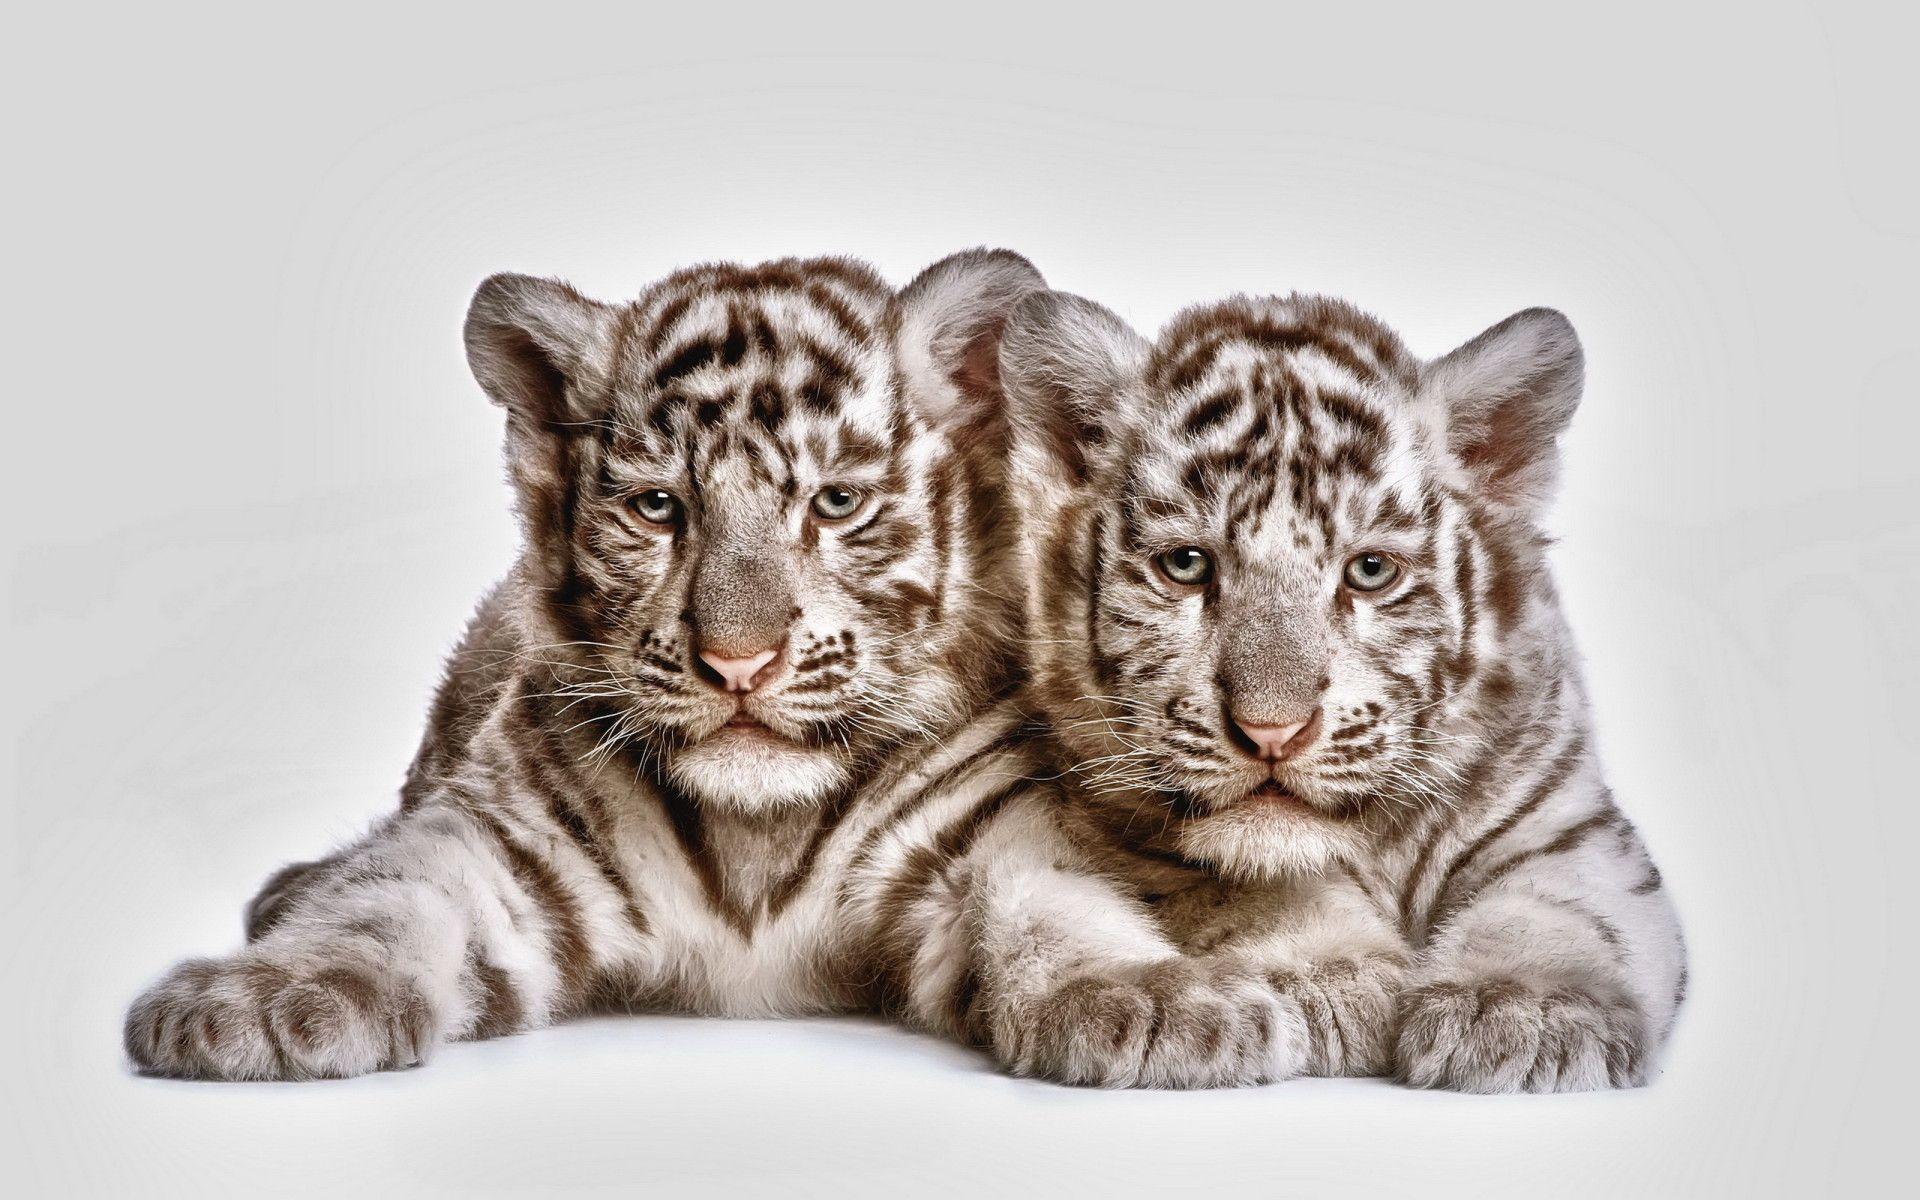 White Tiger Computer Wallpapers Desktop Backgrounds 1920x1200 Id 318785 Cute Tiger Cubs Baby White Tiger White Tiger Cubs